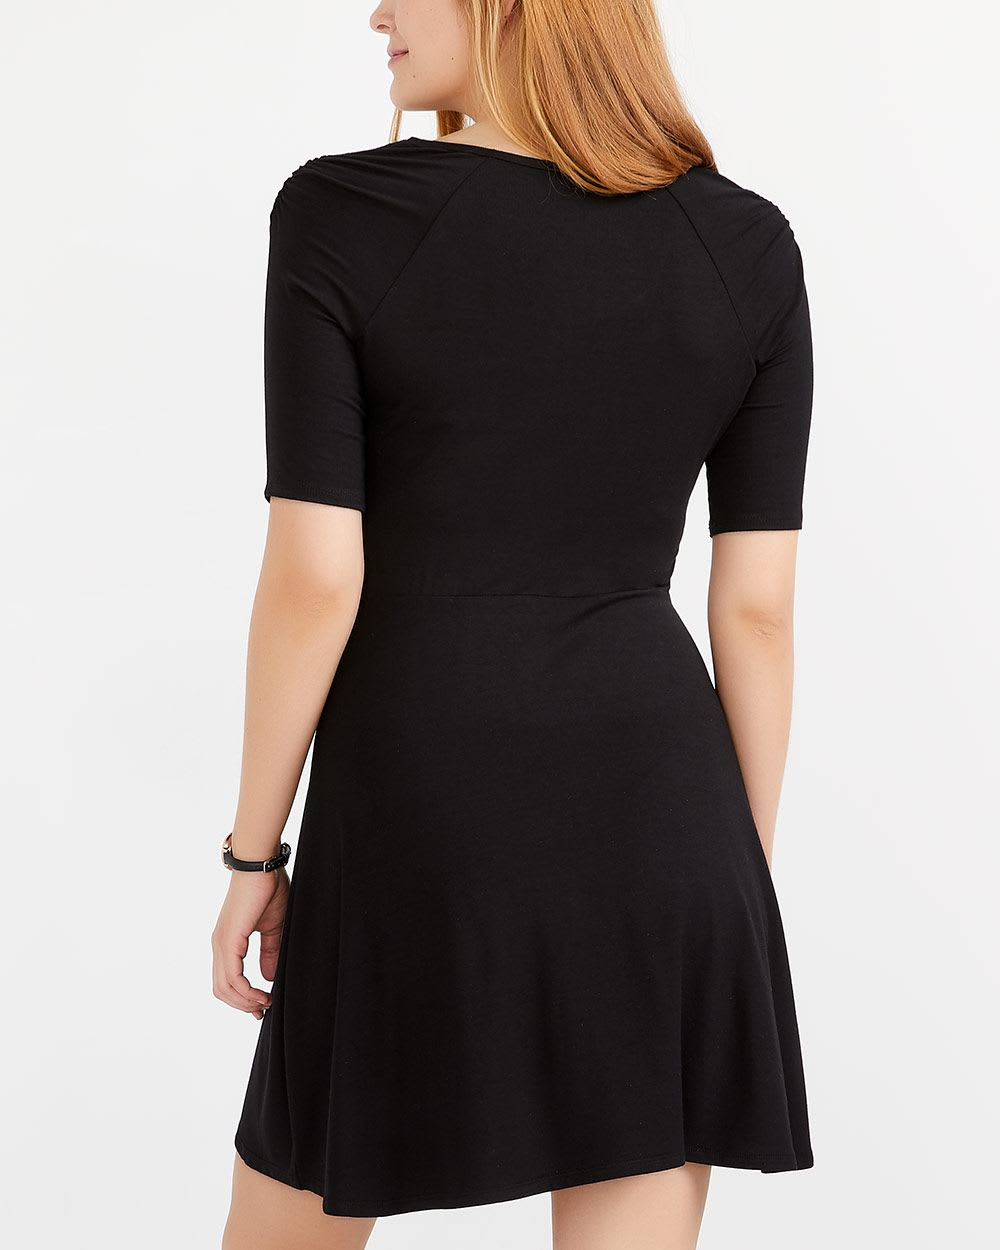 Ruched Raglan ¾ Sleeve Dress